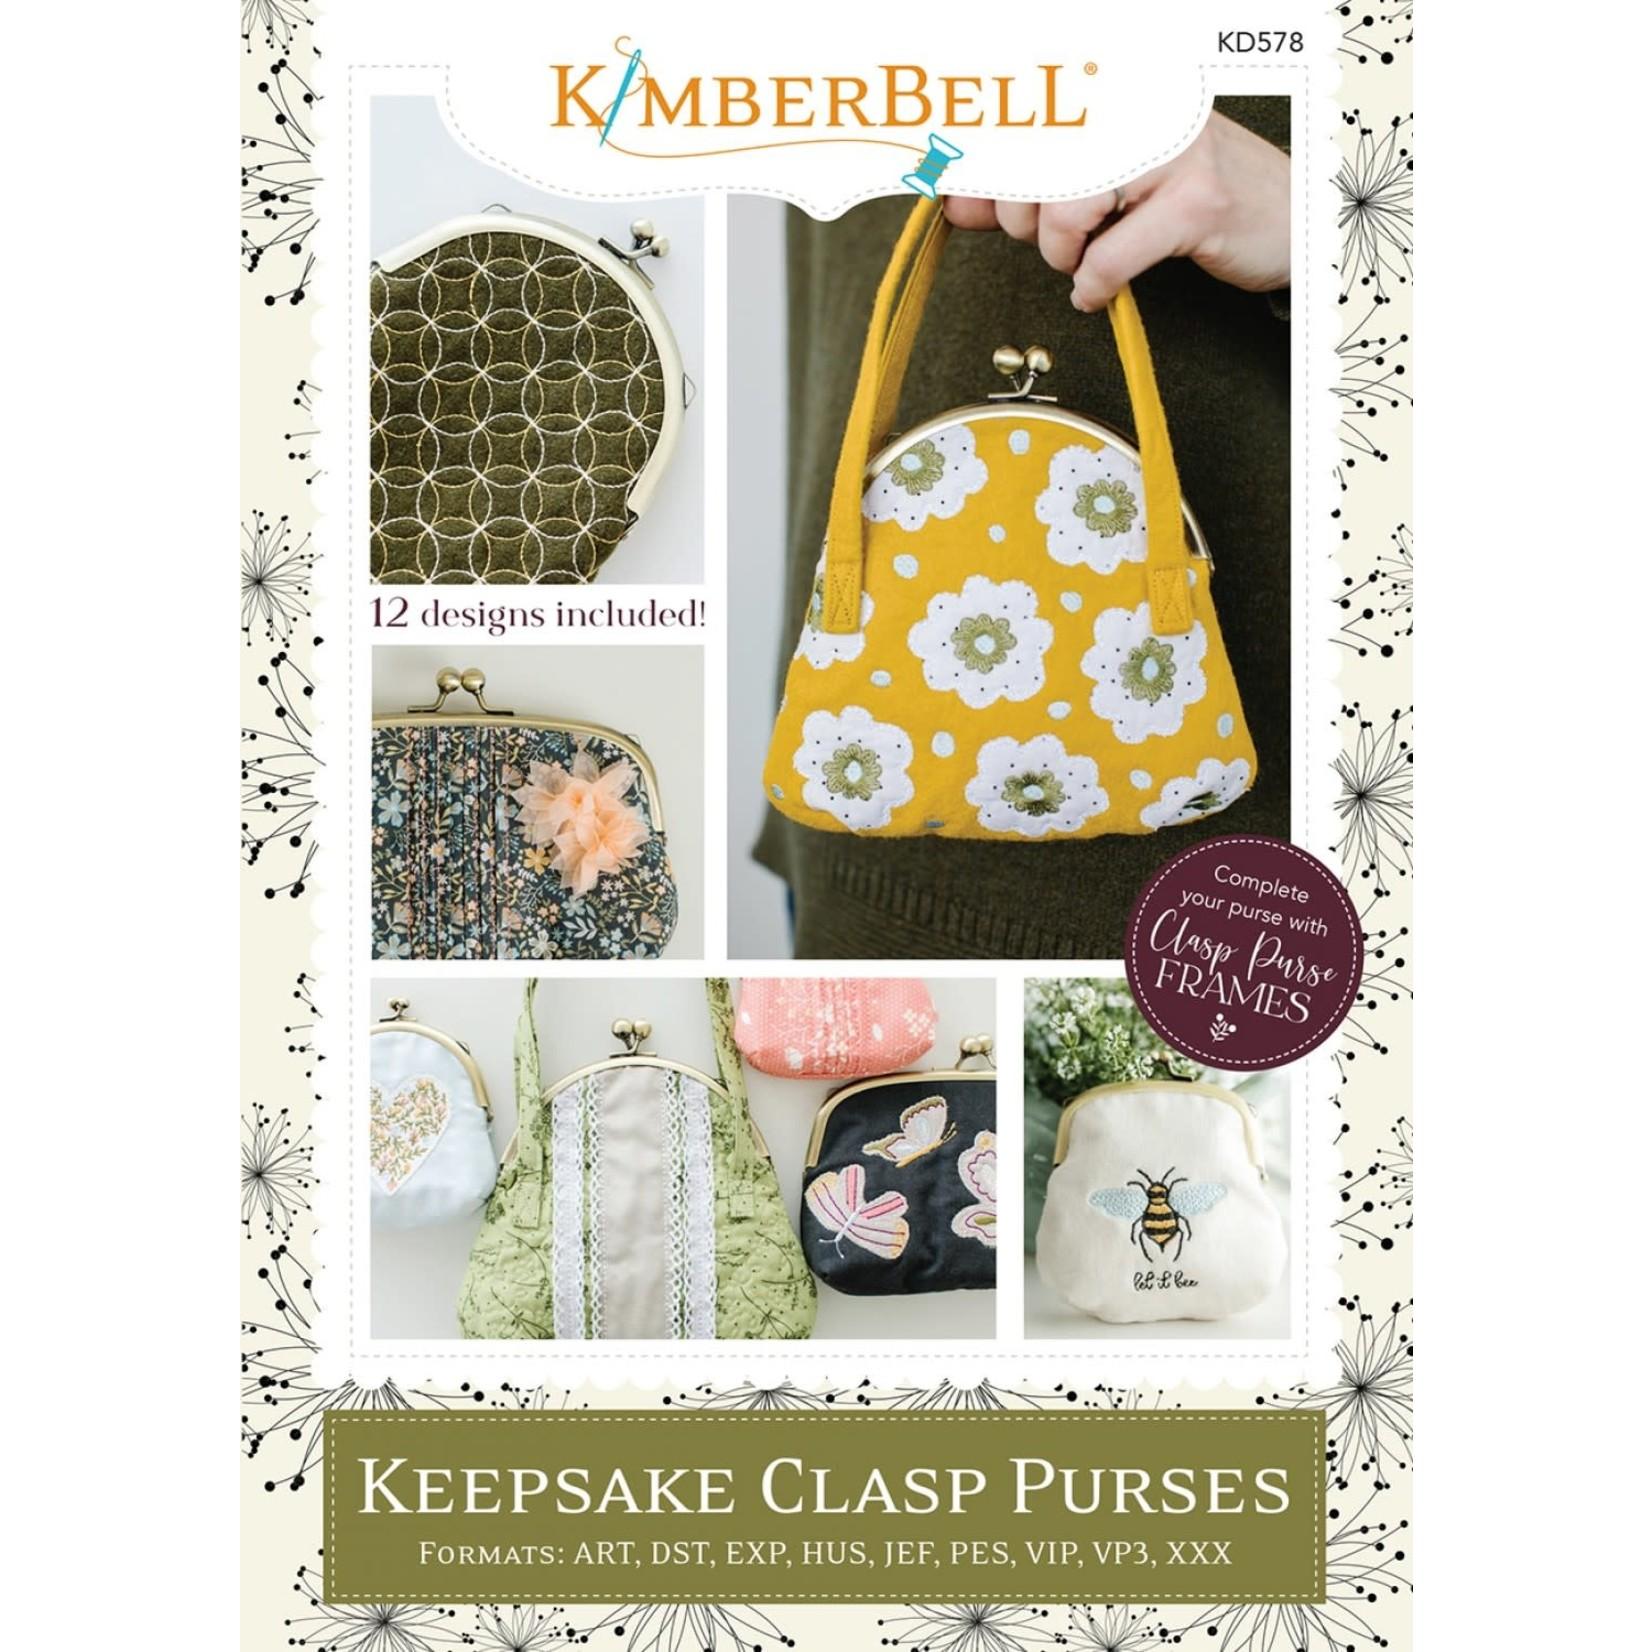 Kimberbell Designs Keepsake Clasp Purses